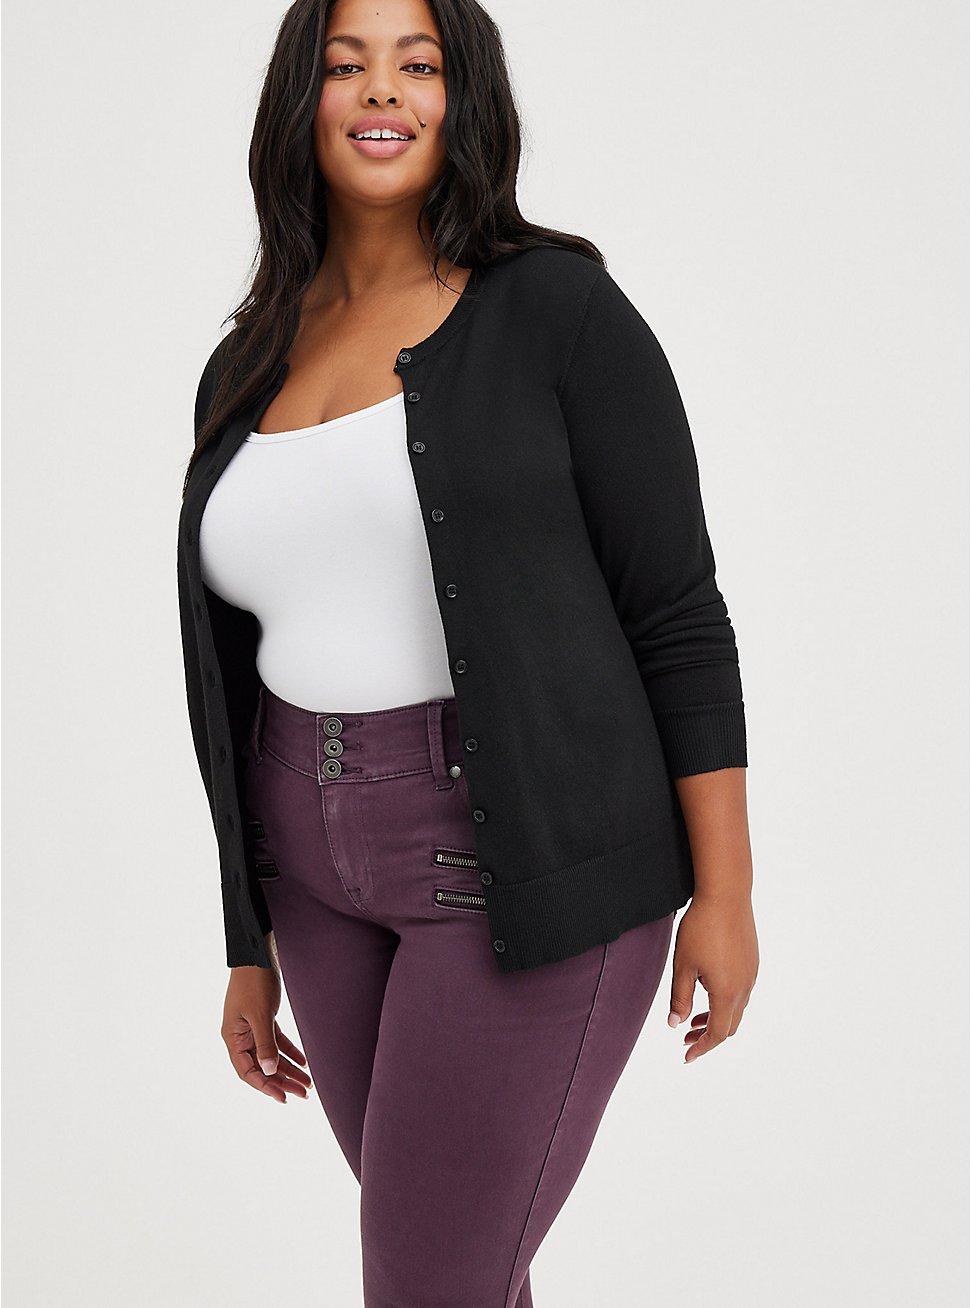 Classic Cardigan Sweater - Ultra Soft Black, DEEP BLACK, hi-res